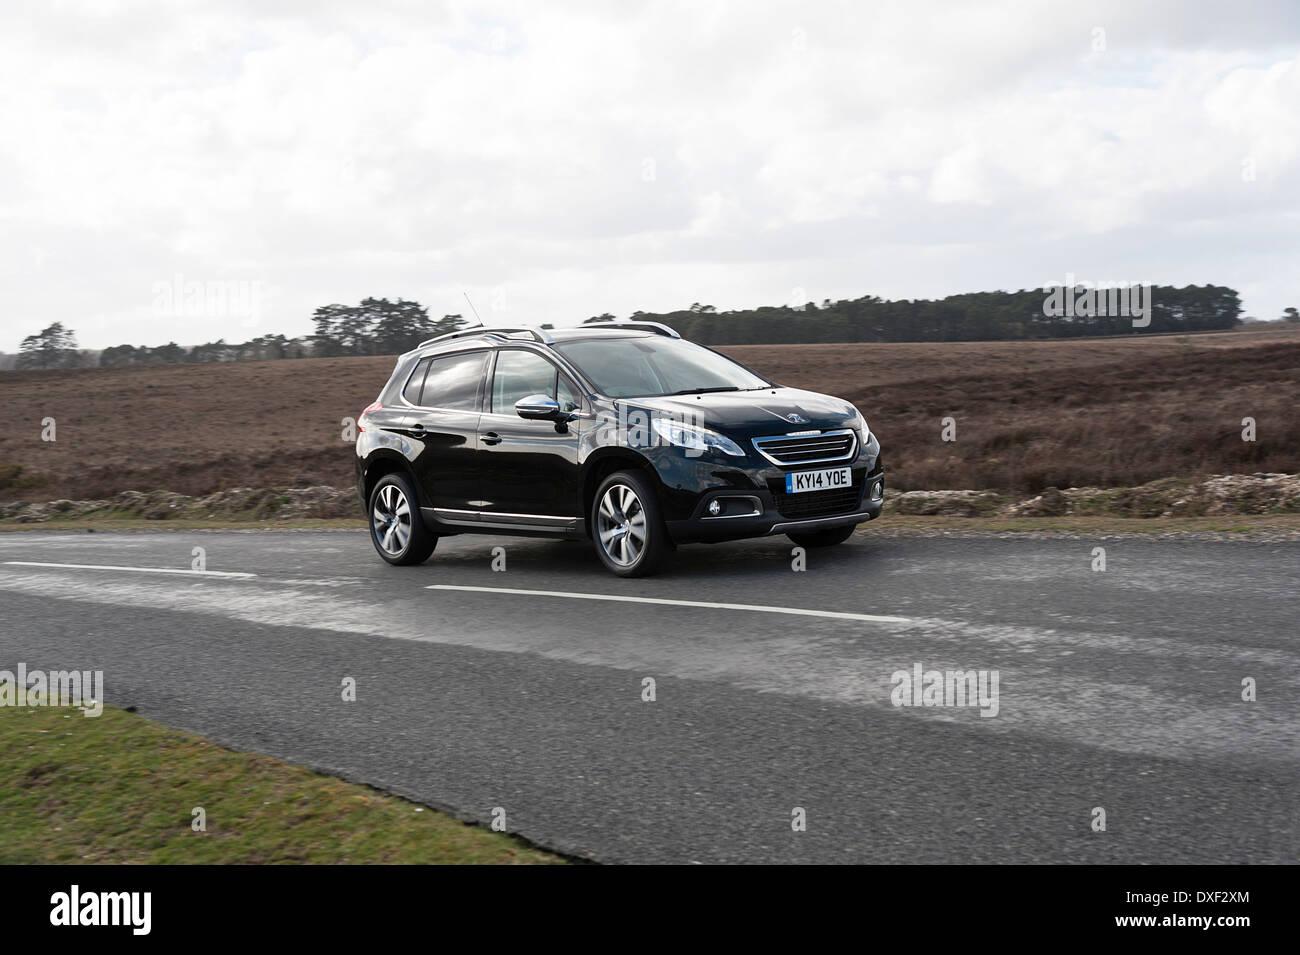 2014 Peugeot 2008 HDi Feline - Stock Image